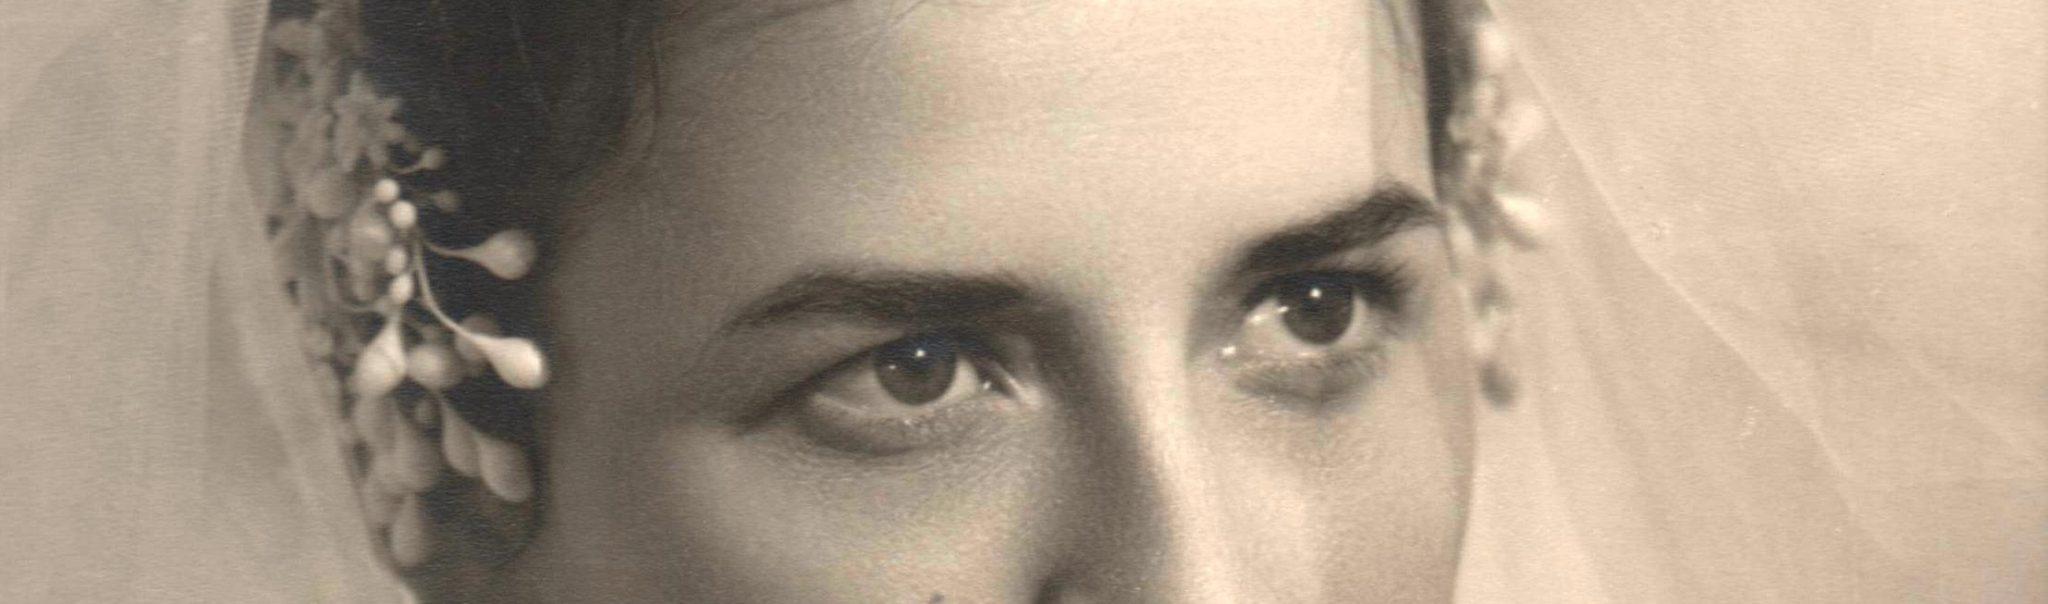 ojos mamá boda